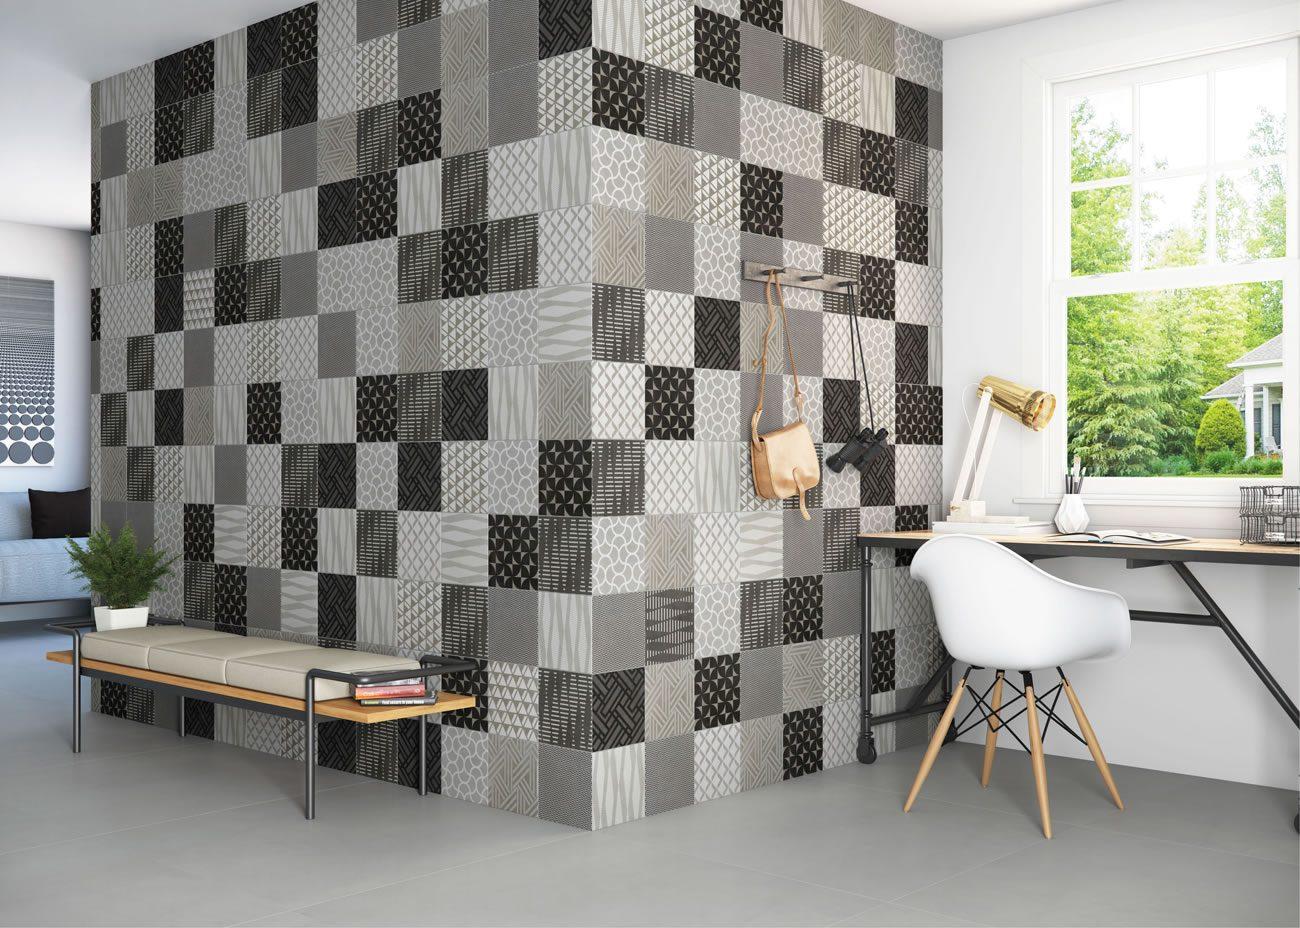 entorno de Eliane: patchwork-cimento-ma-20x20cm_munari-cemento-ac-60x60cm-con-01